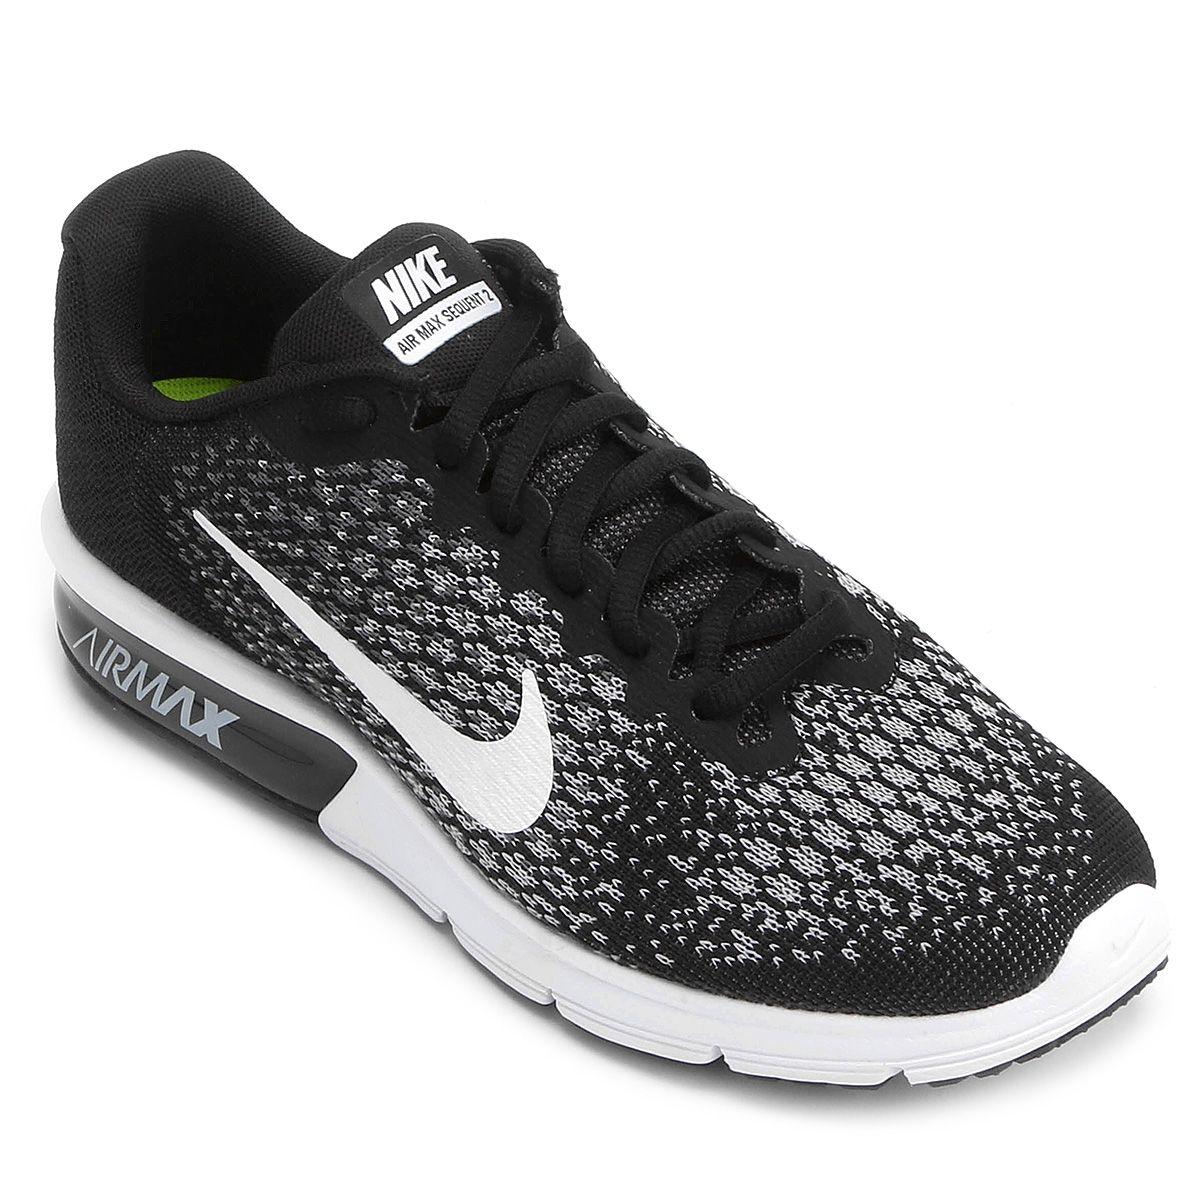 3f94d00c15 Tênis Nike Air Max Sequent 2 Feminino - Preto e Branco